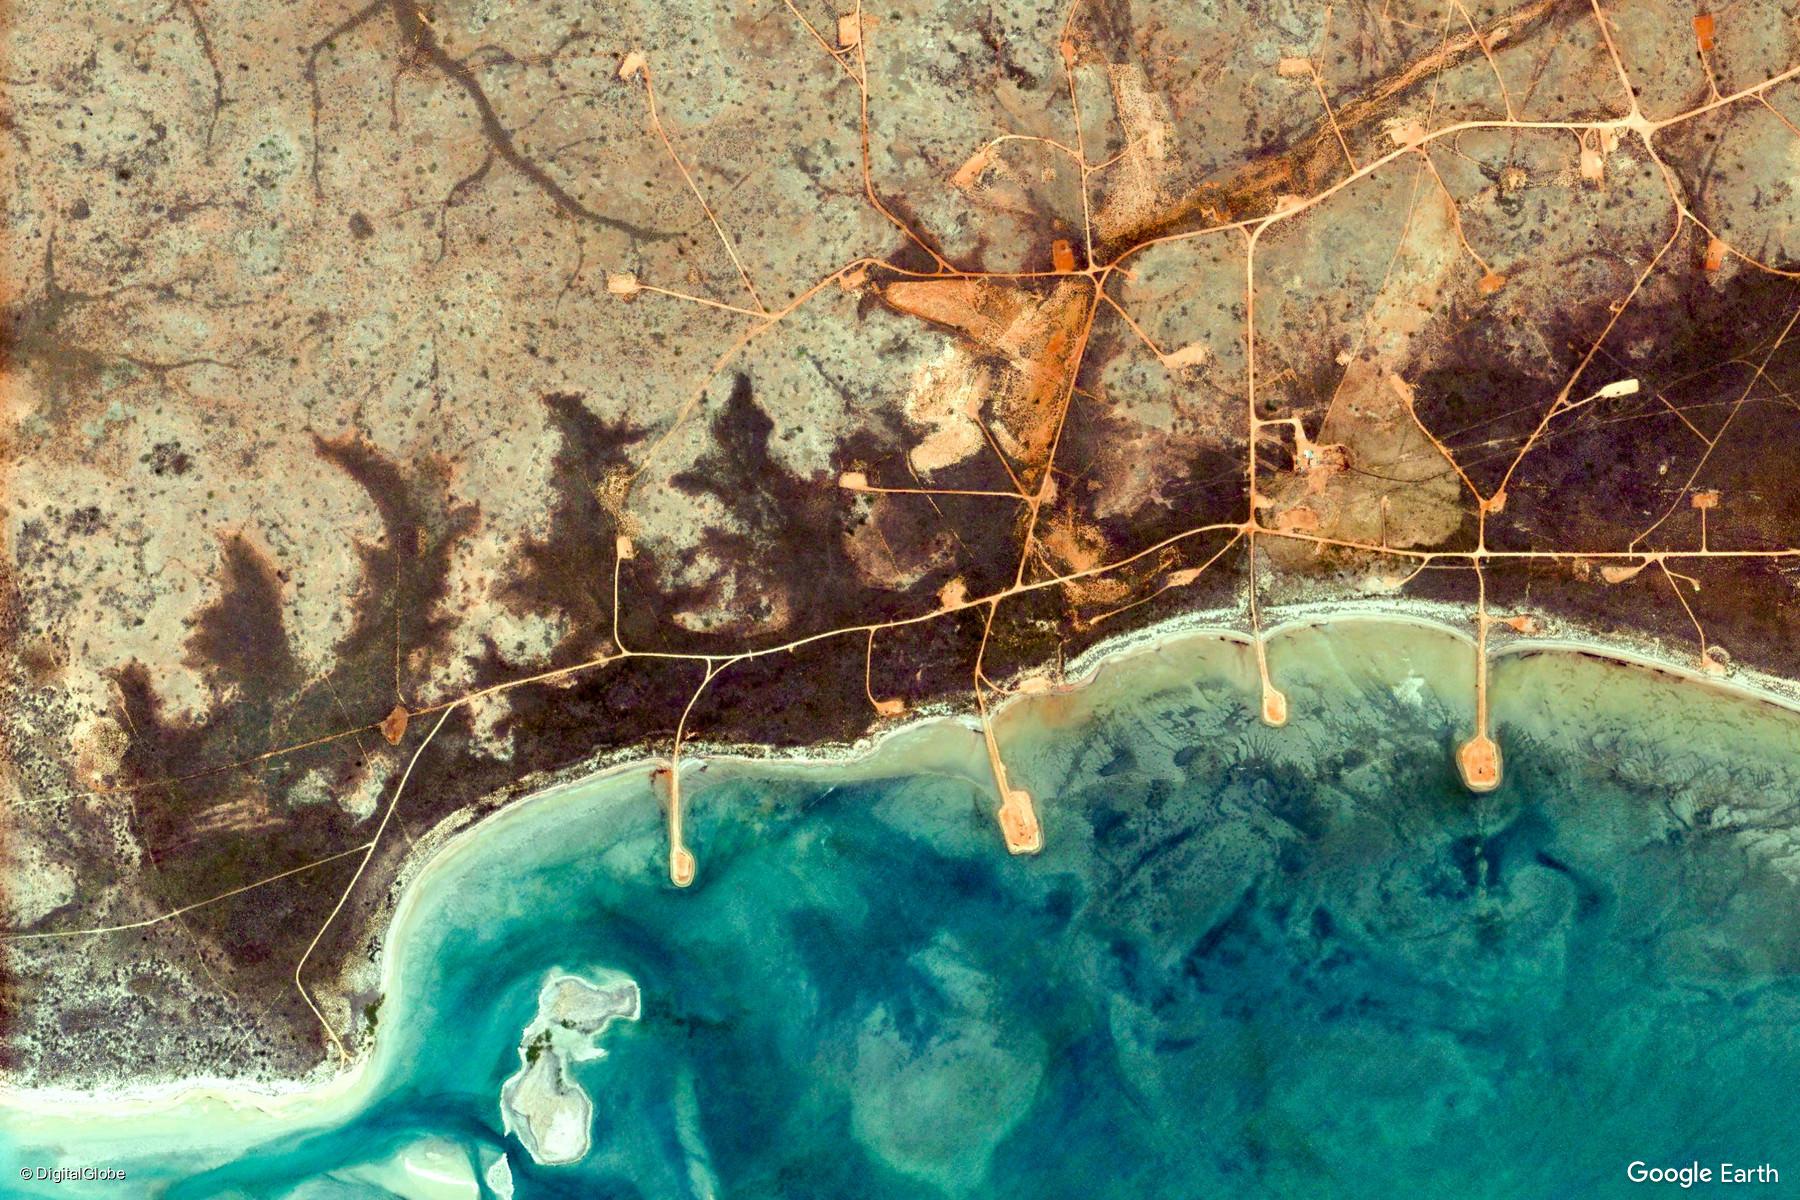 Western Australia, Australia – Earth View from Google